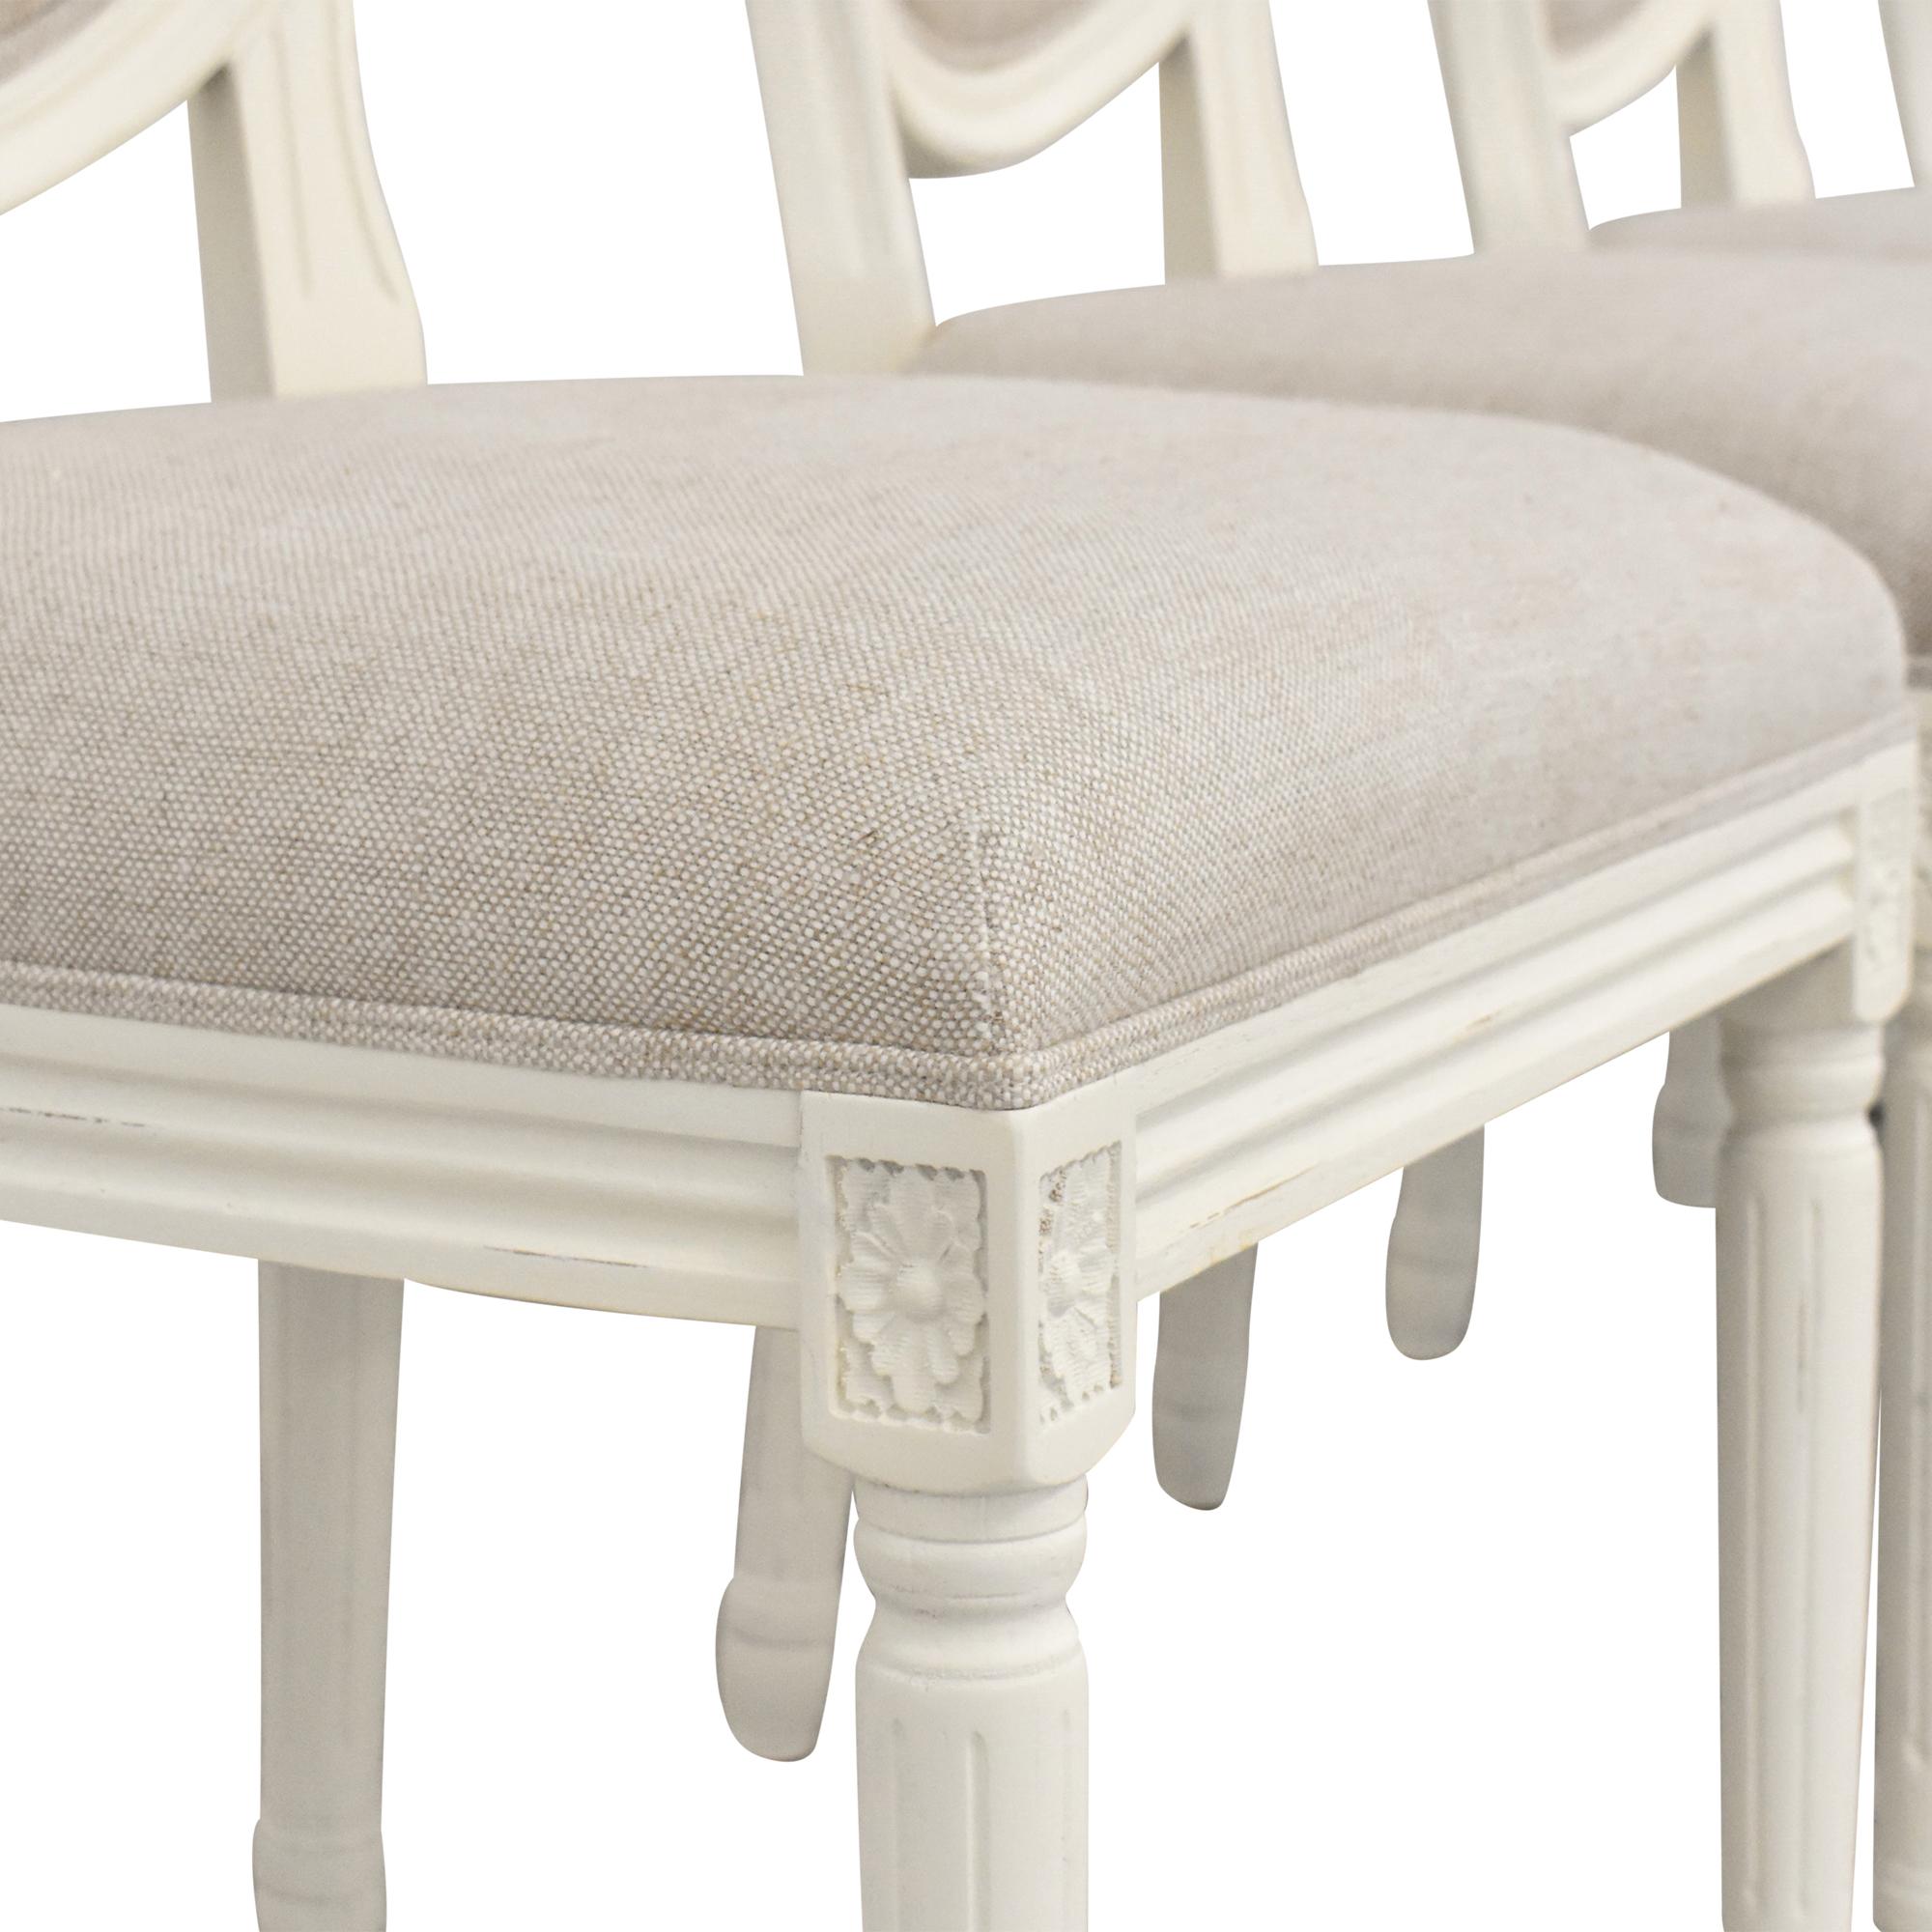 Restoration Hardware Vintage French Round Side Chairs sale